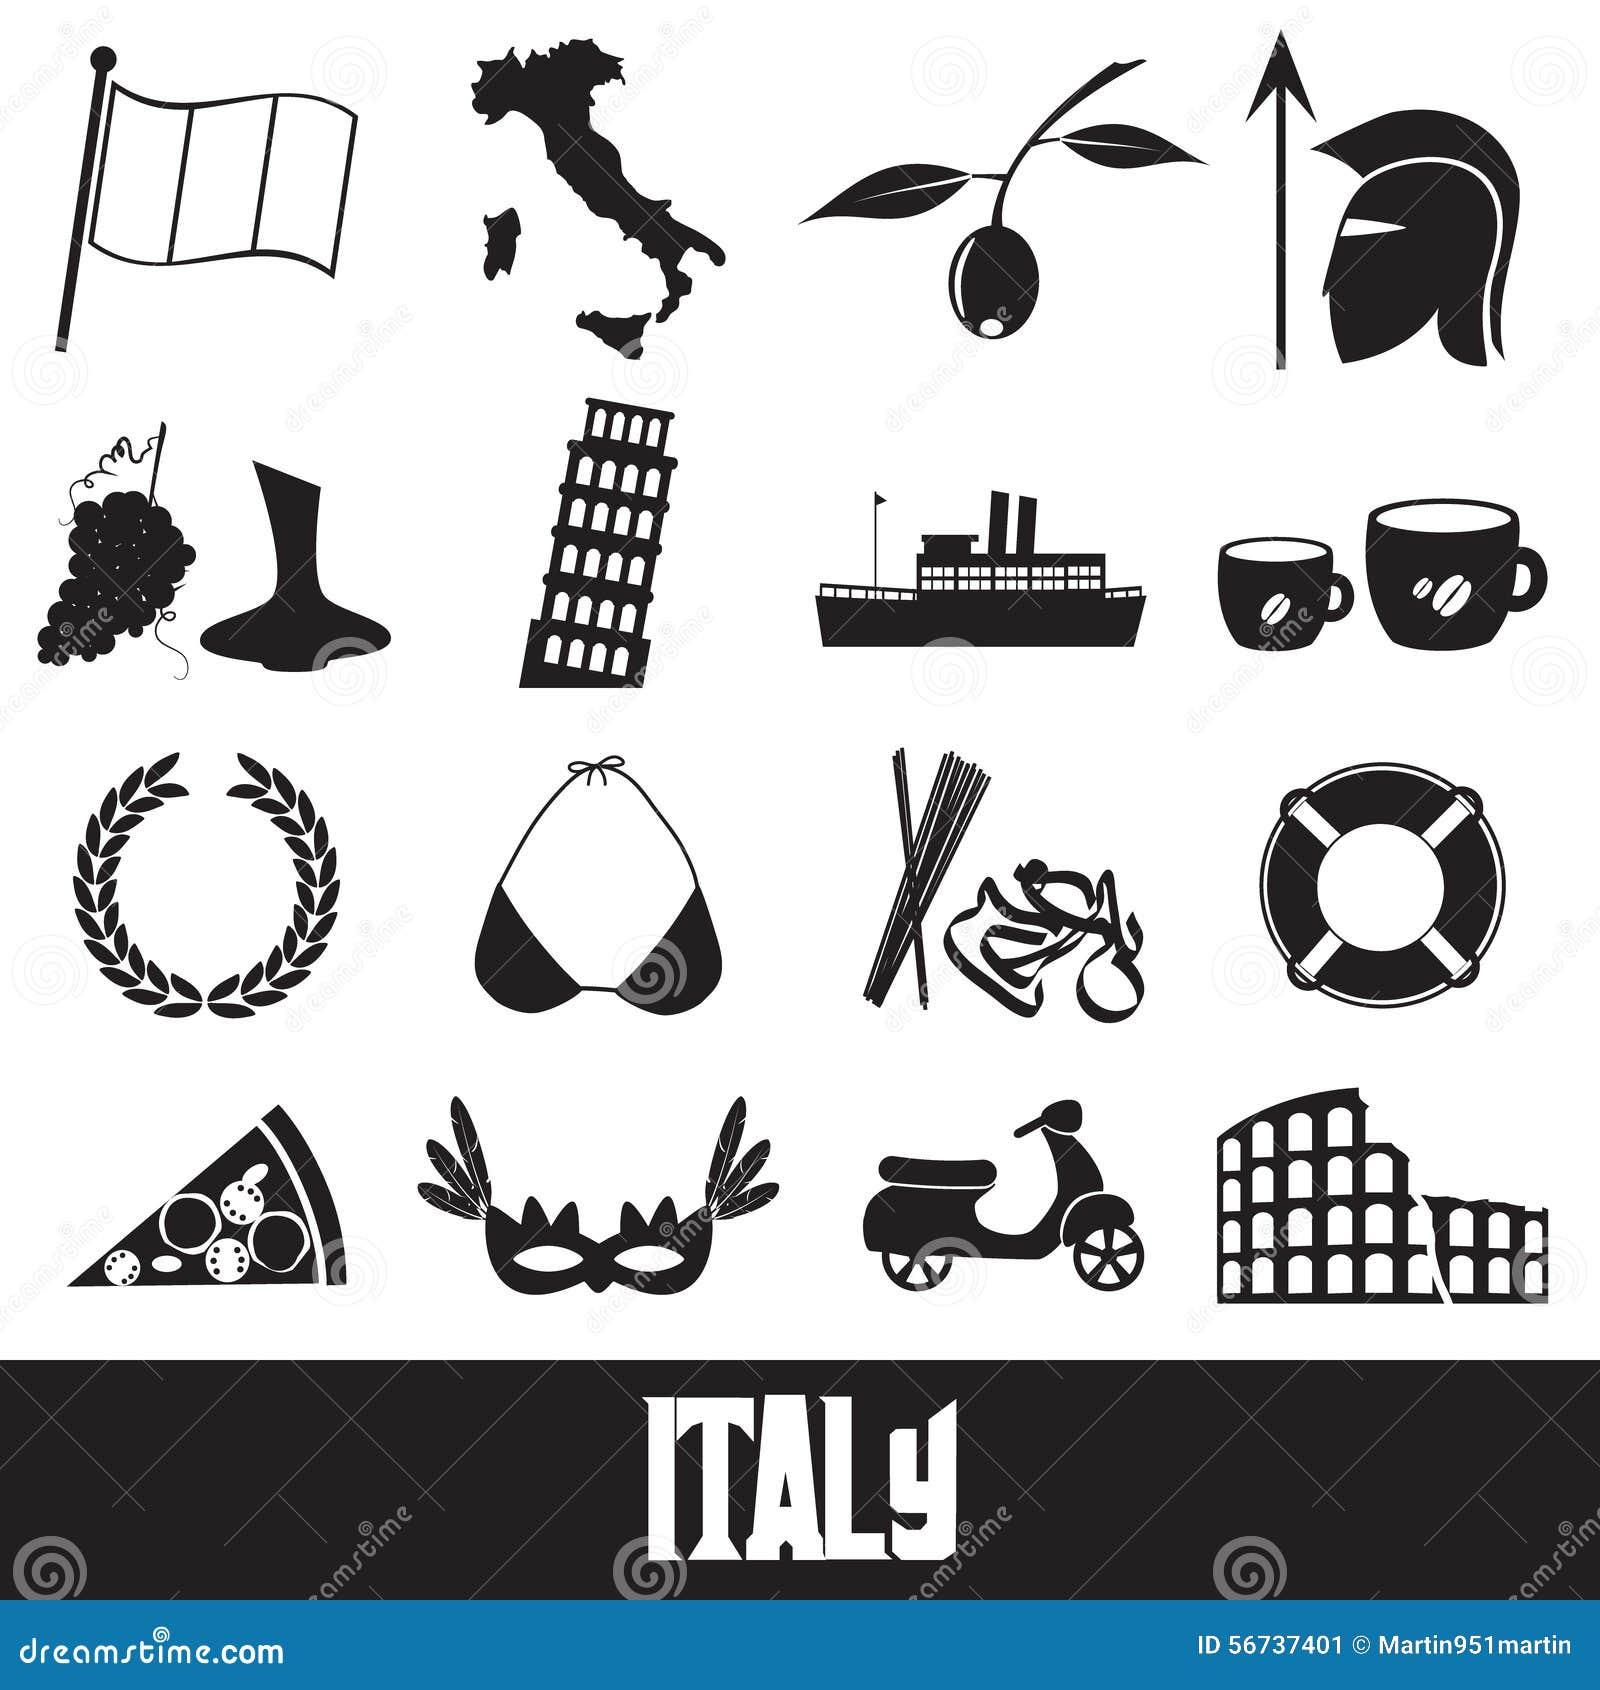 Italy Country Theme Symbols And Icons Set Eps10 Stock Illustration